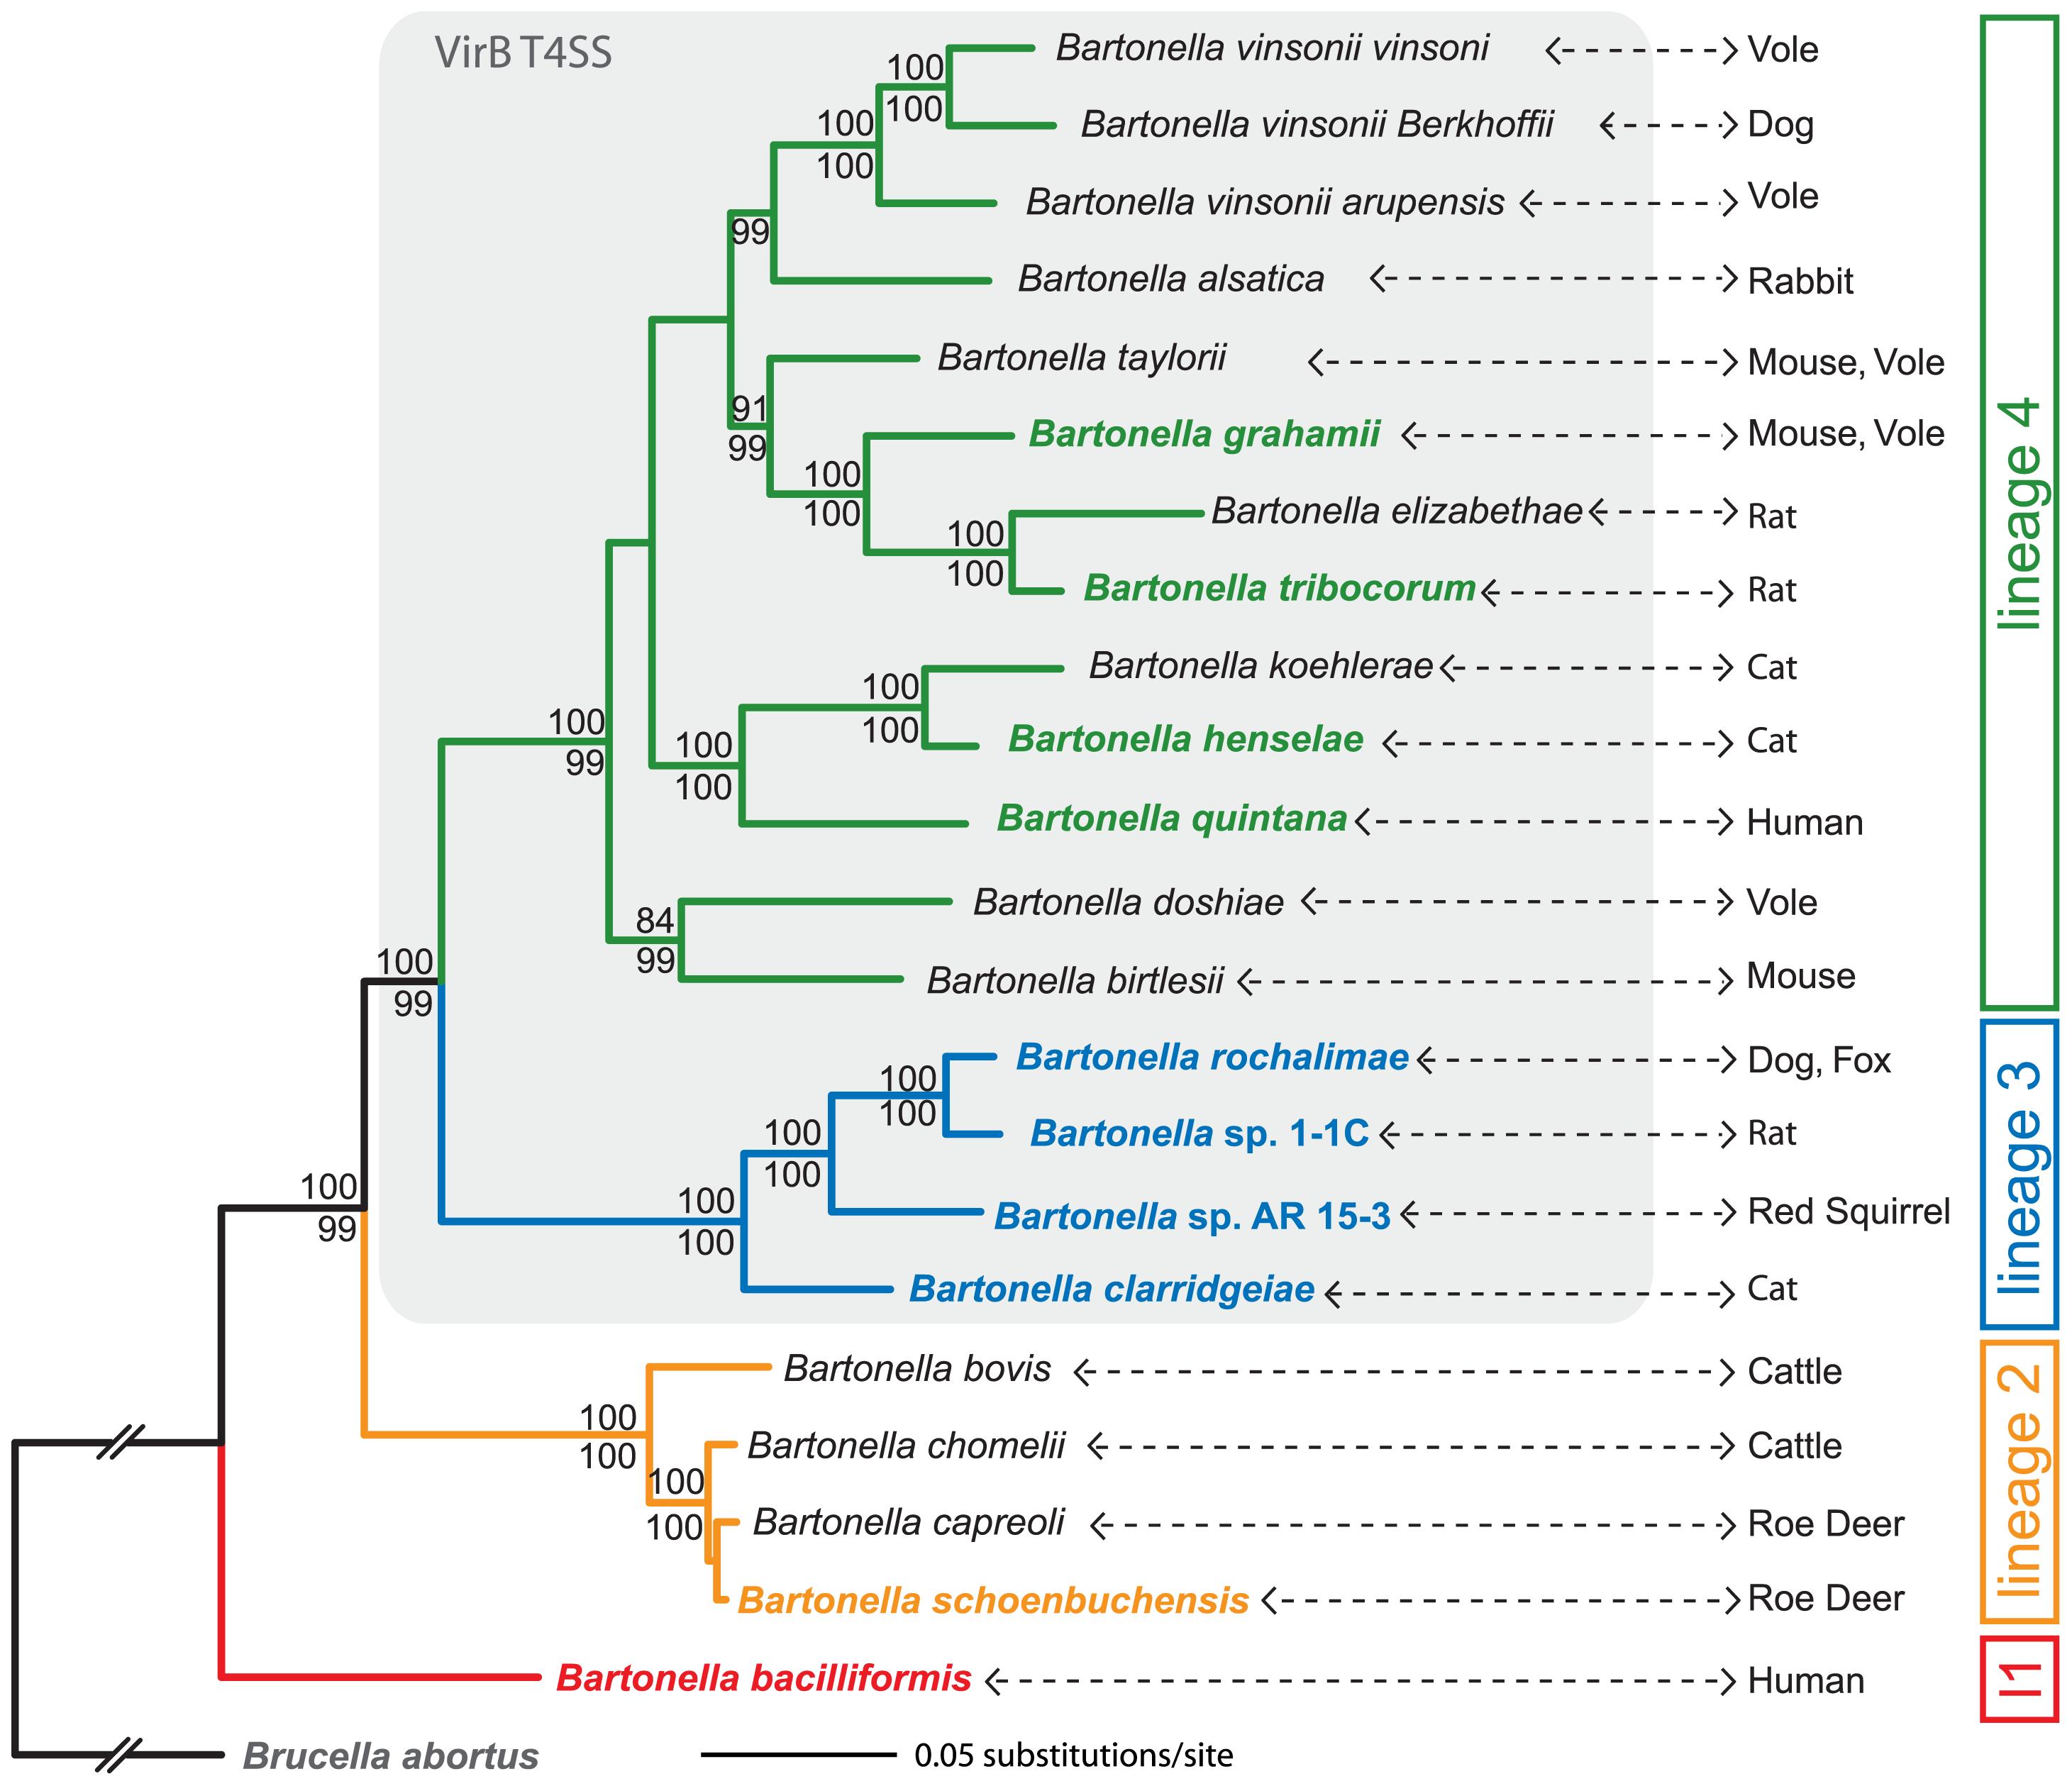 Phylogeny of <i>Bartonella</i> based on a genome-wide dataset.